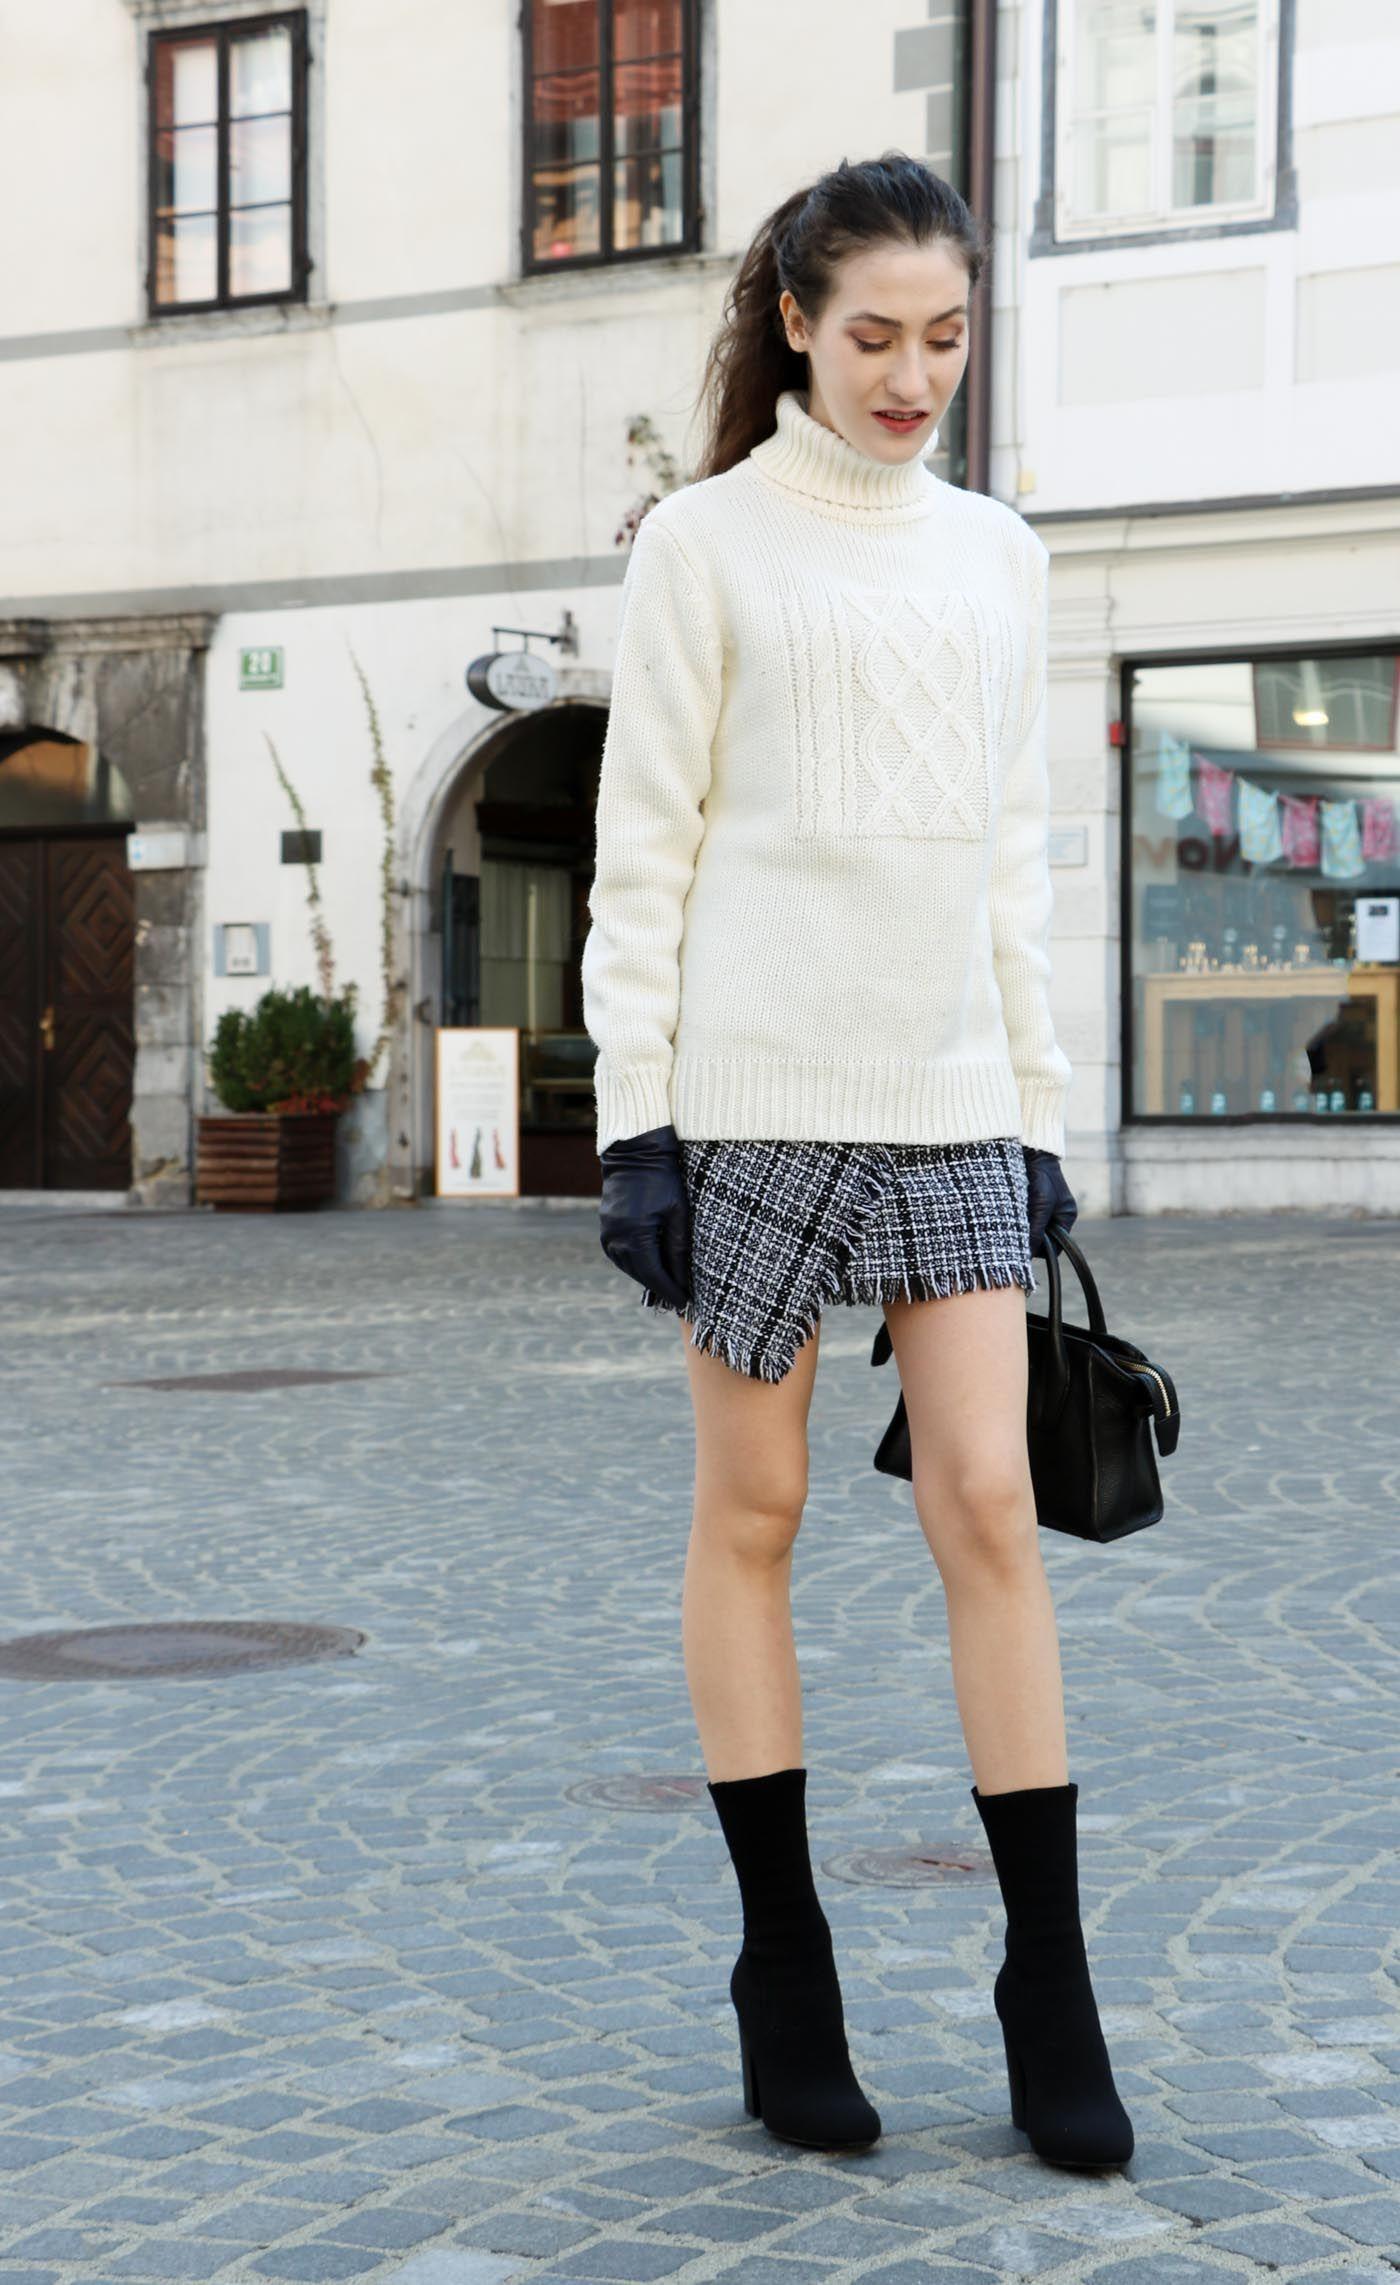 b44891915b20 Fashion Blogger Veronika Lipar of Brunette from Wall Street